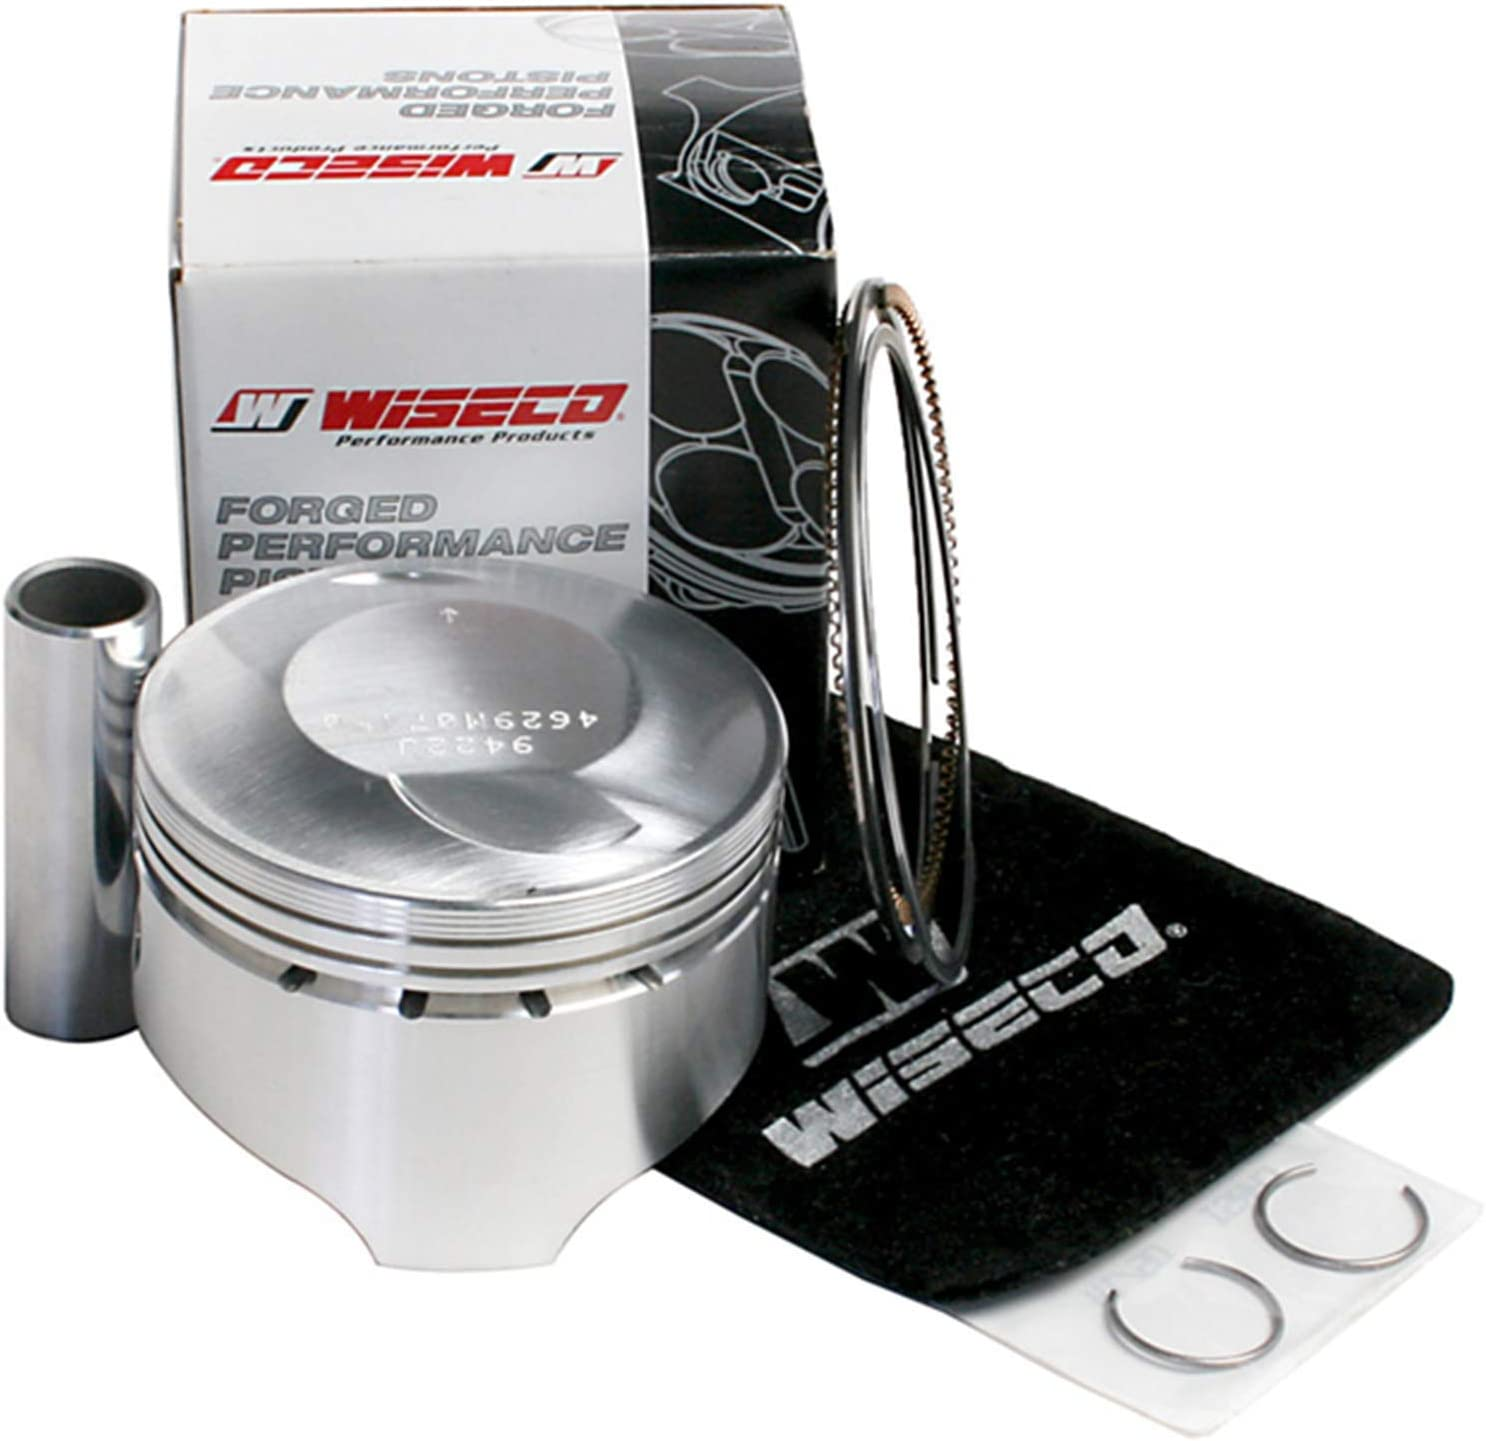 Piston Kit 2.00mm Oversize to 76.00mm For 1999 Honda TRX300FW FourTrax 4x4 ATVs